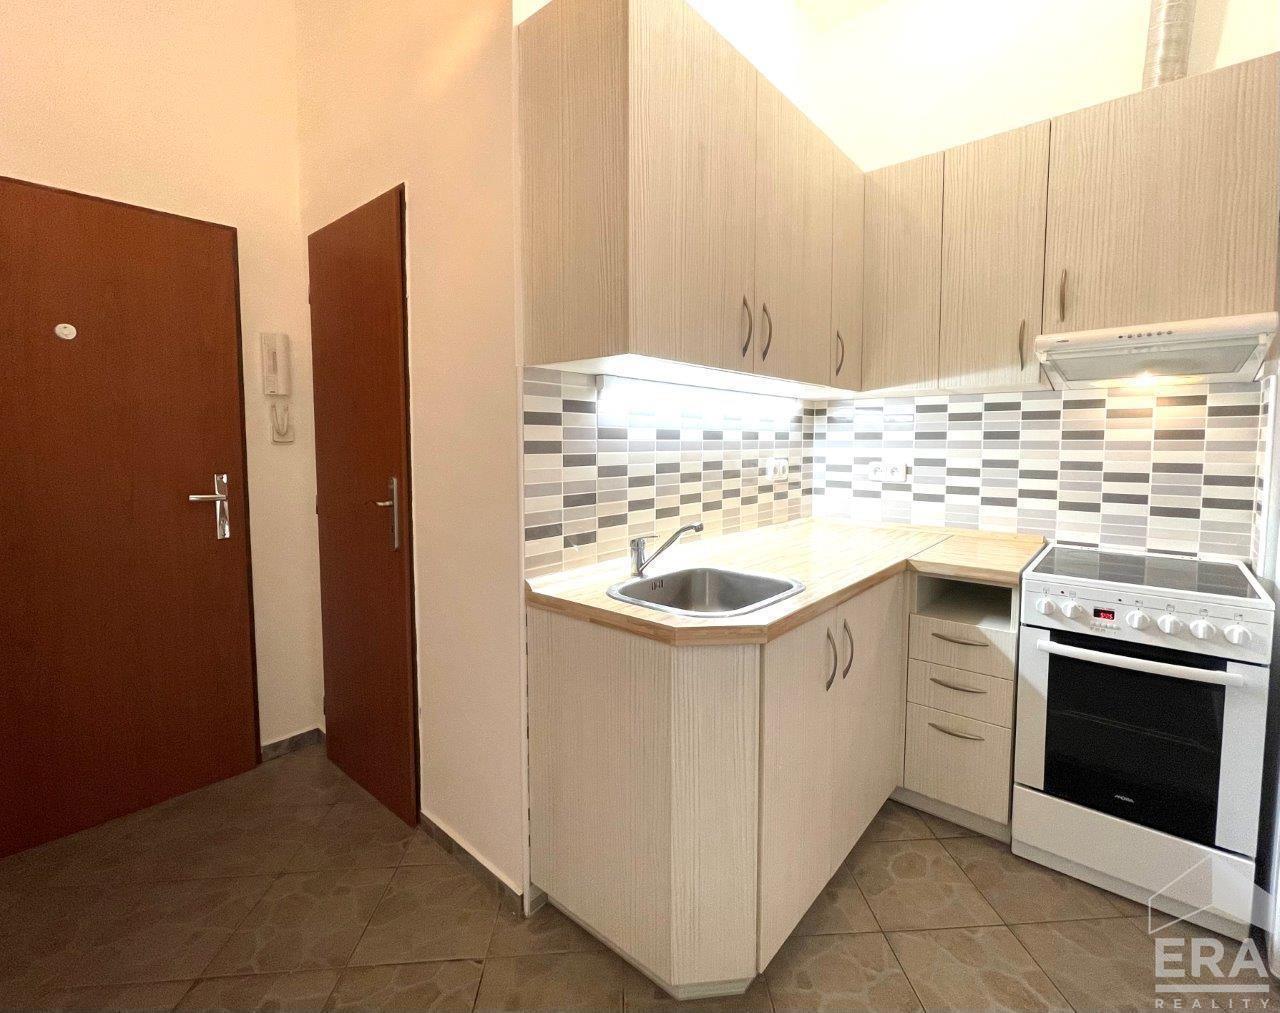 Pronájem bytu 2+1, 46 m2, Radlická ul., Praha 5 – Smíchov